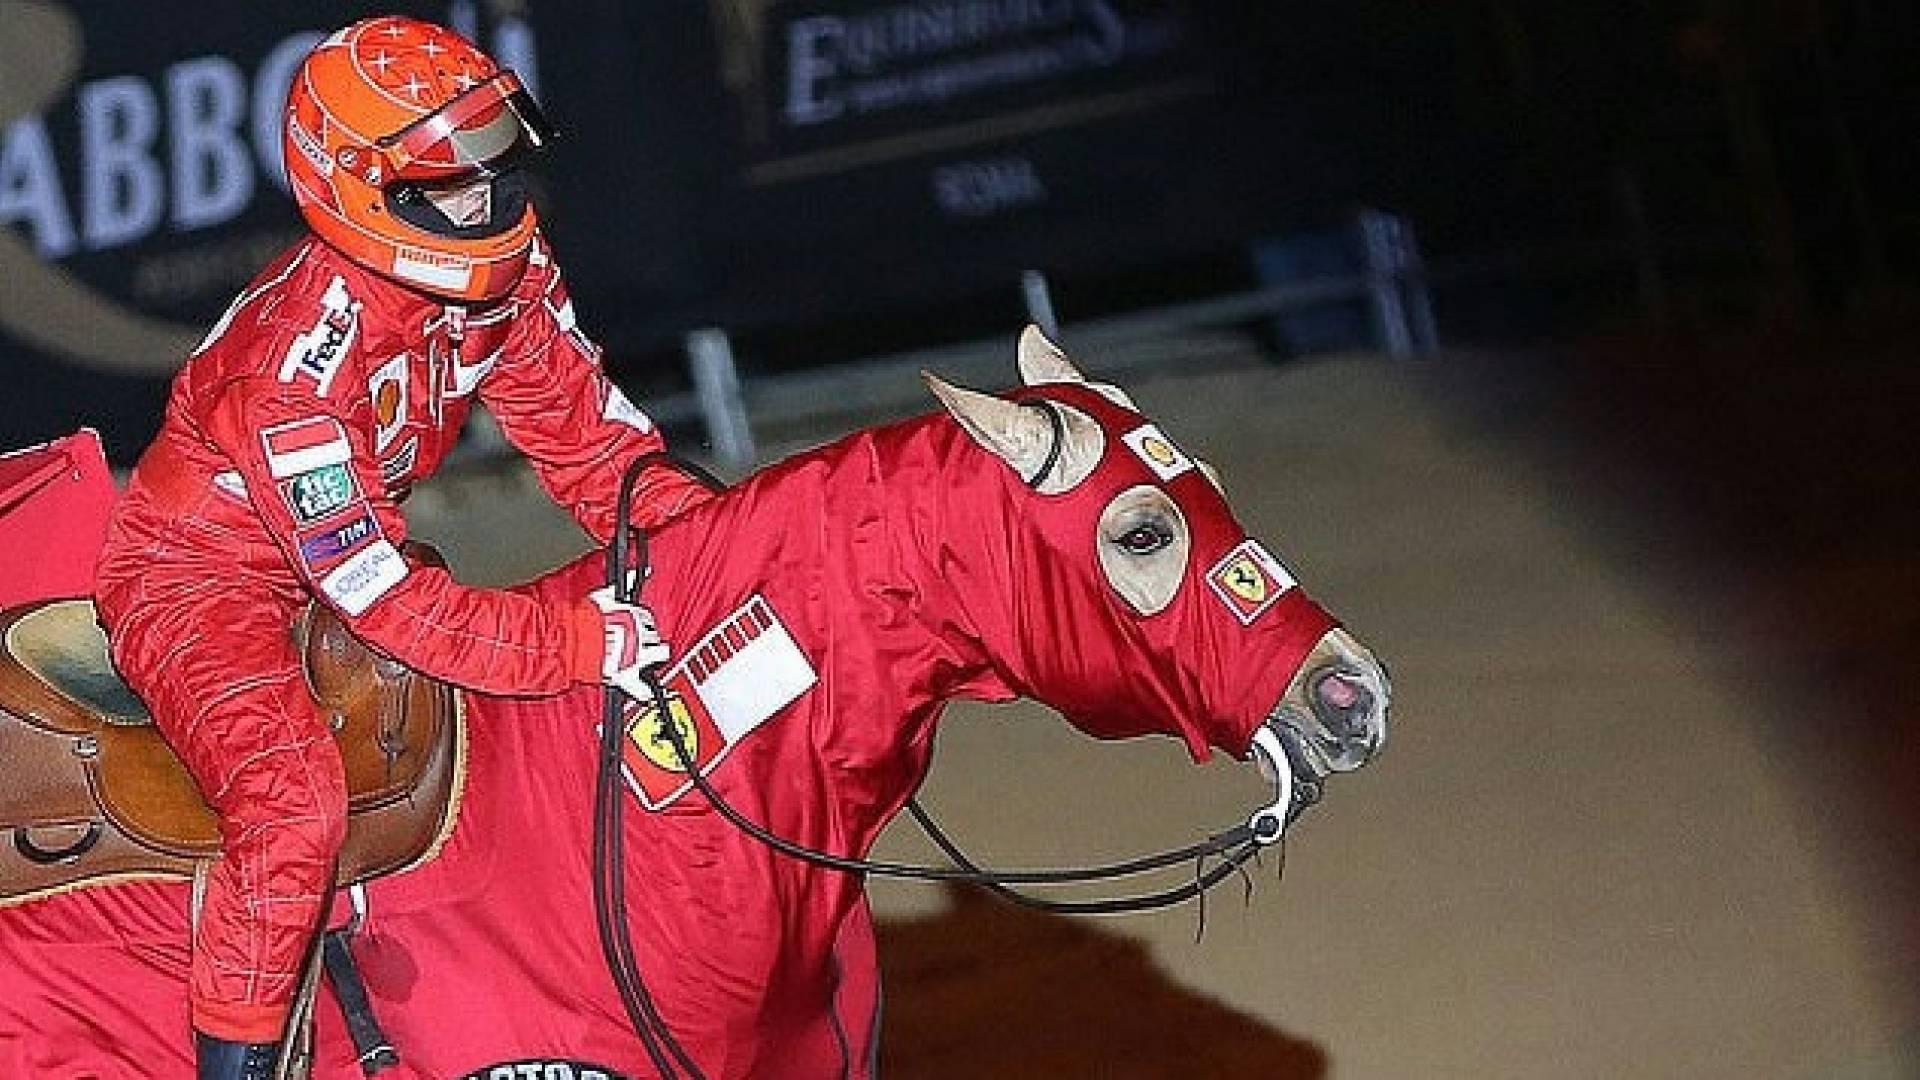 Gina Maria Michael Schumacher (3)